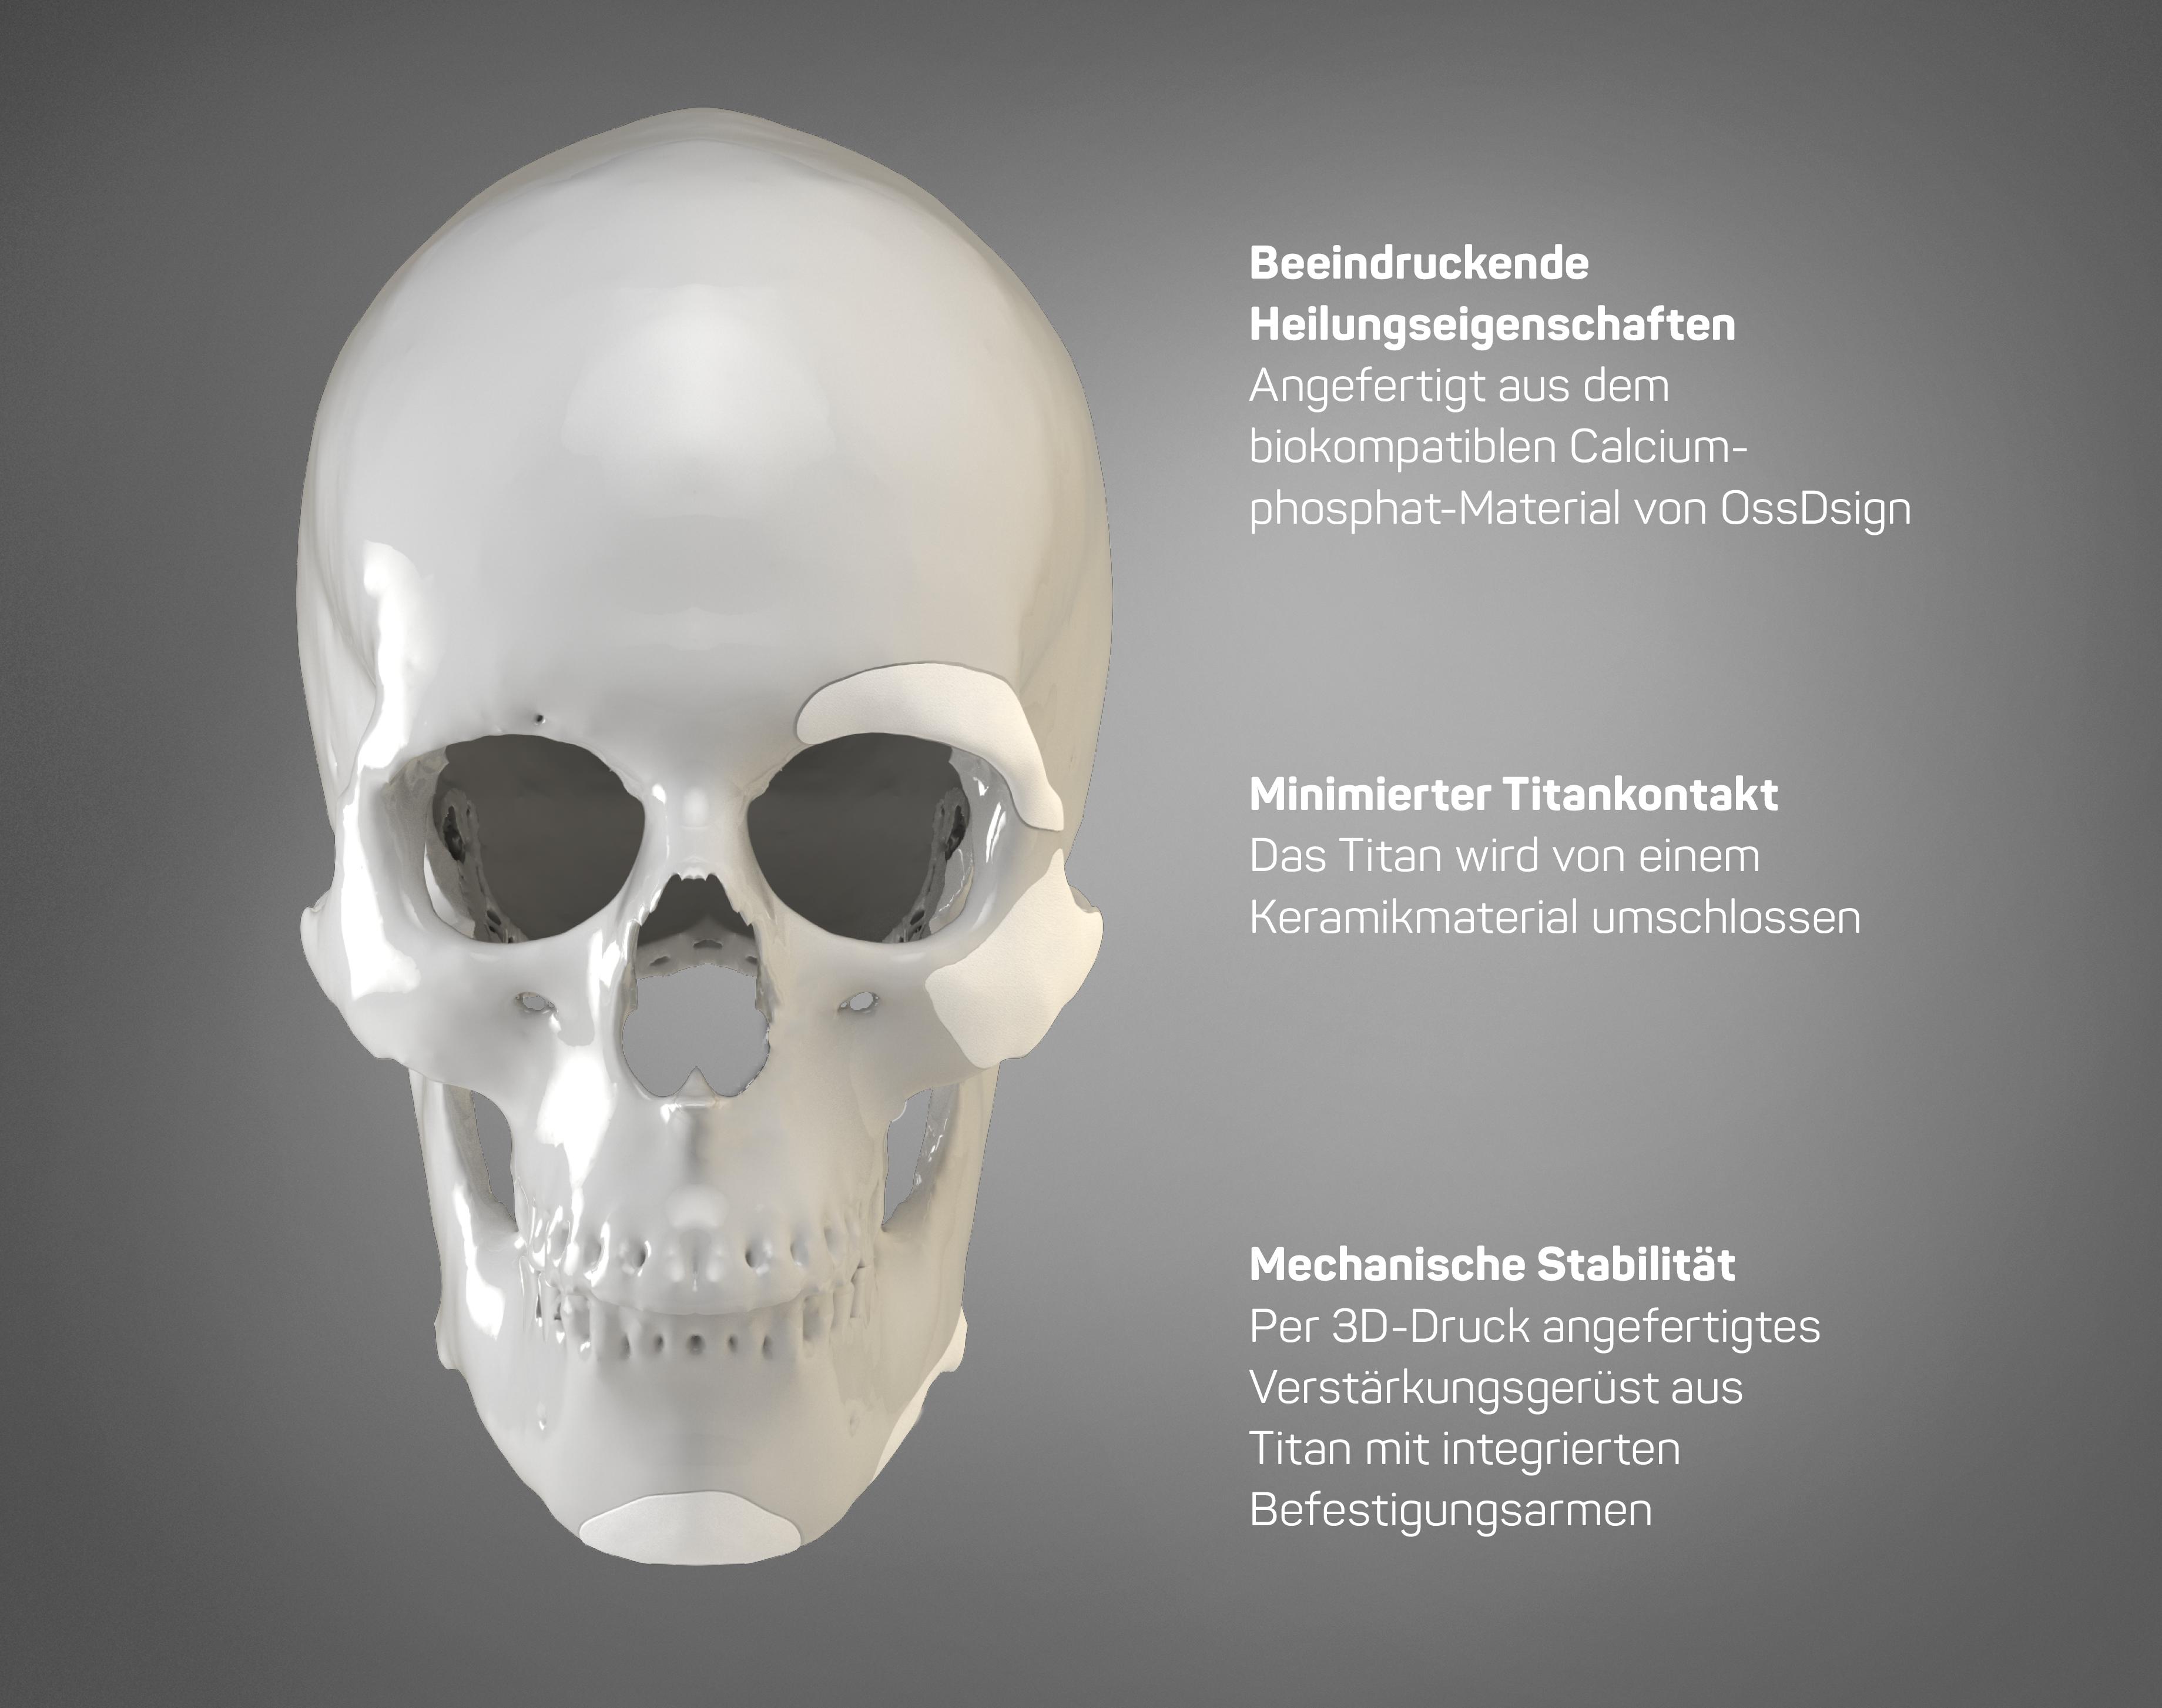 OSSDSIGN Facial PSI (de)